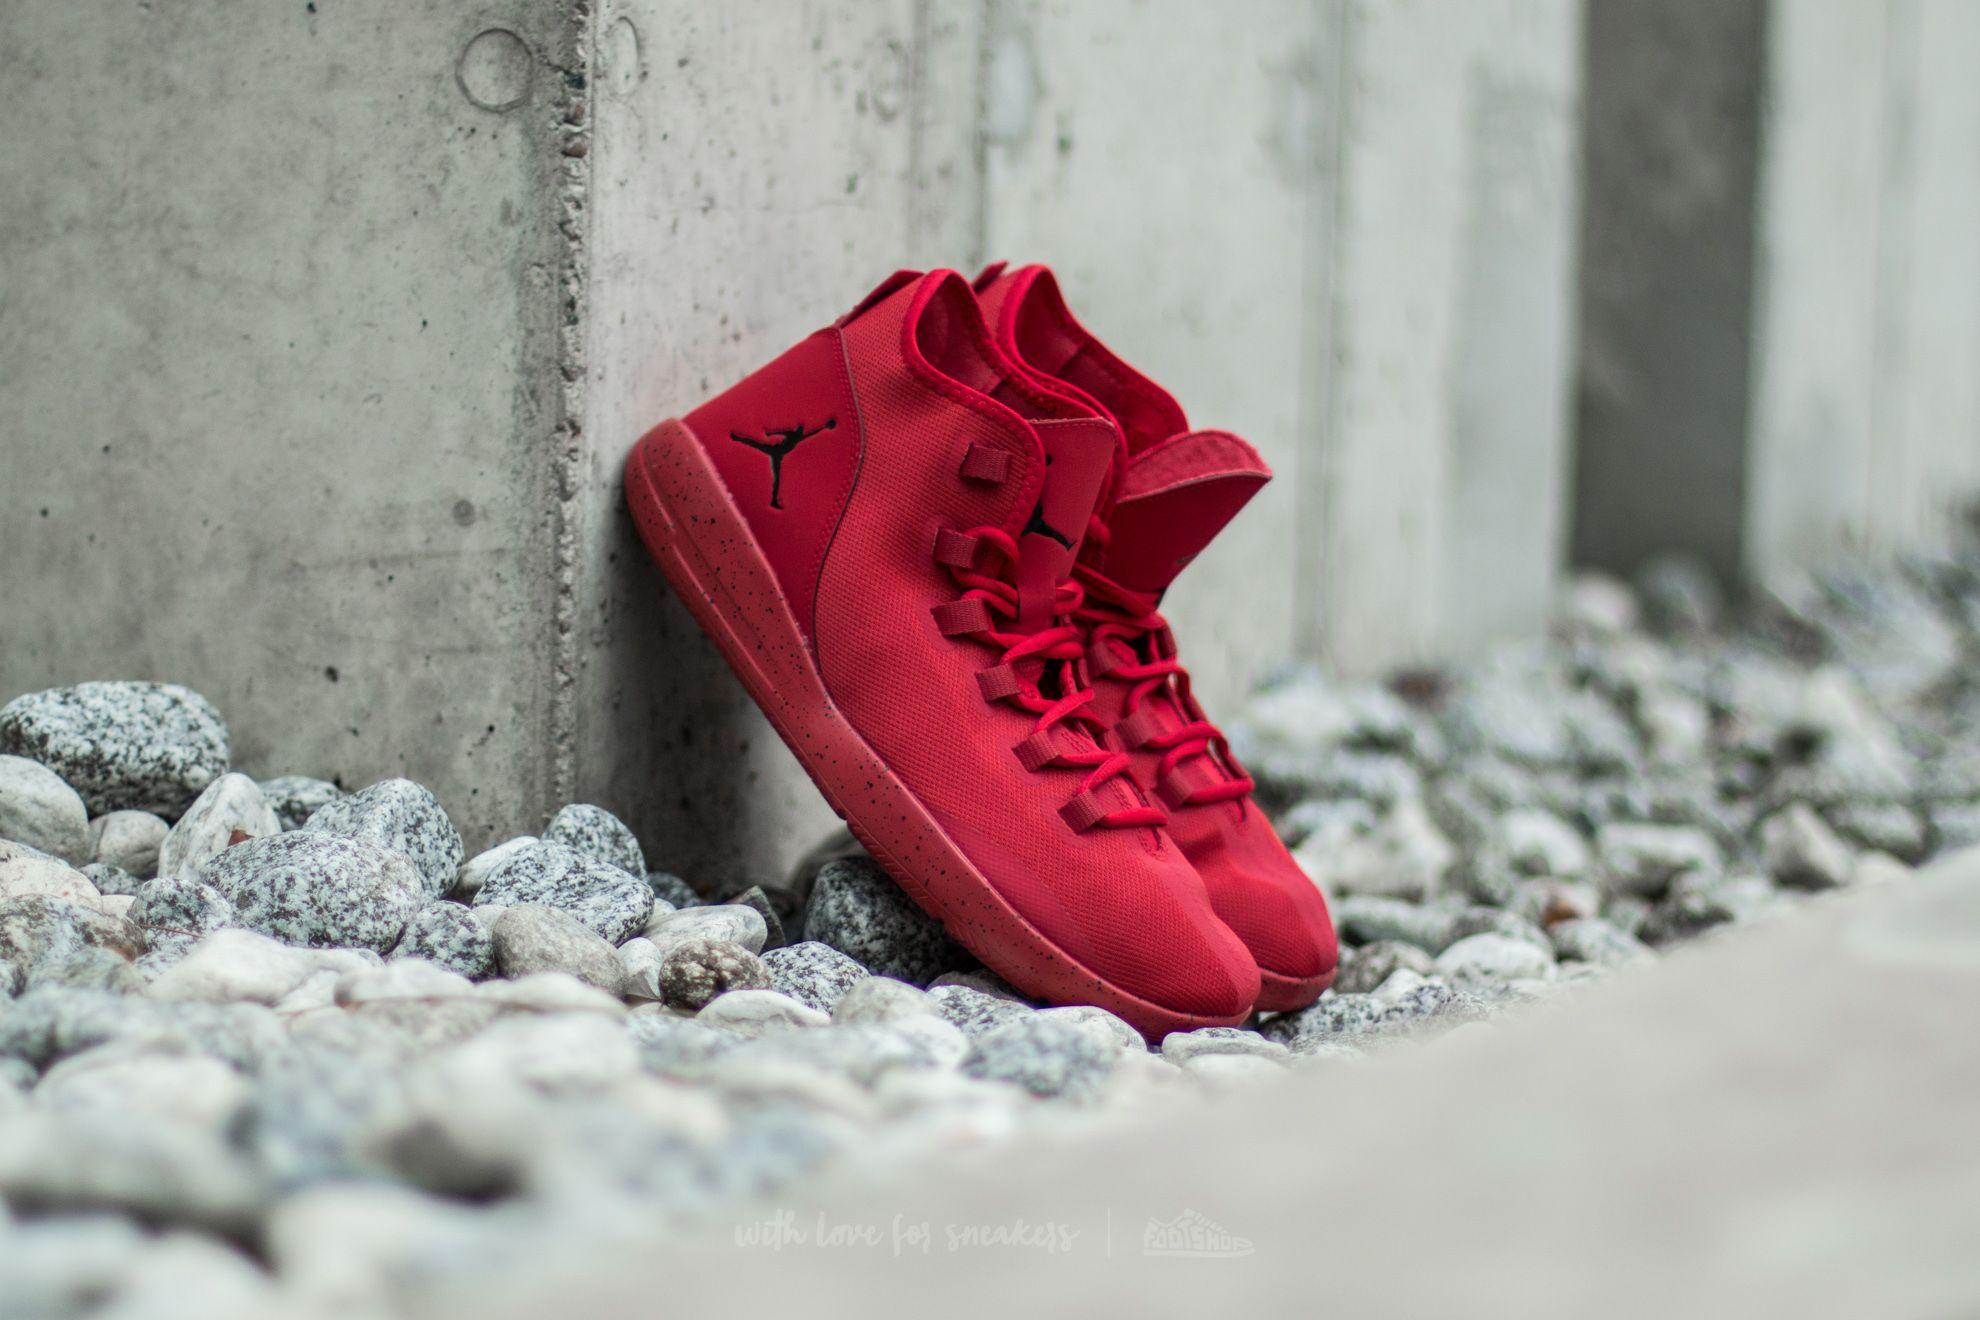 pick up 7d7e4 9d66e Jordan Reveal. Gym Red  Black-Infrared 23